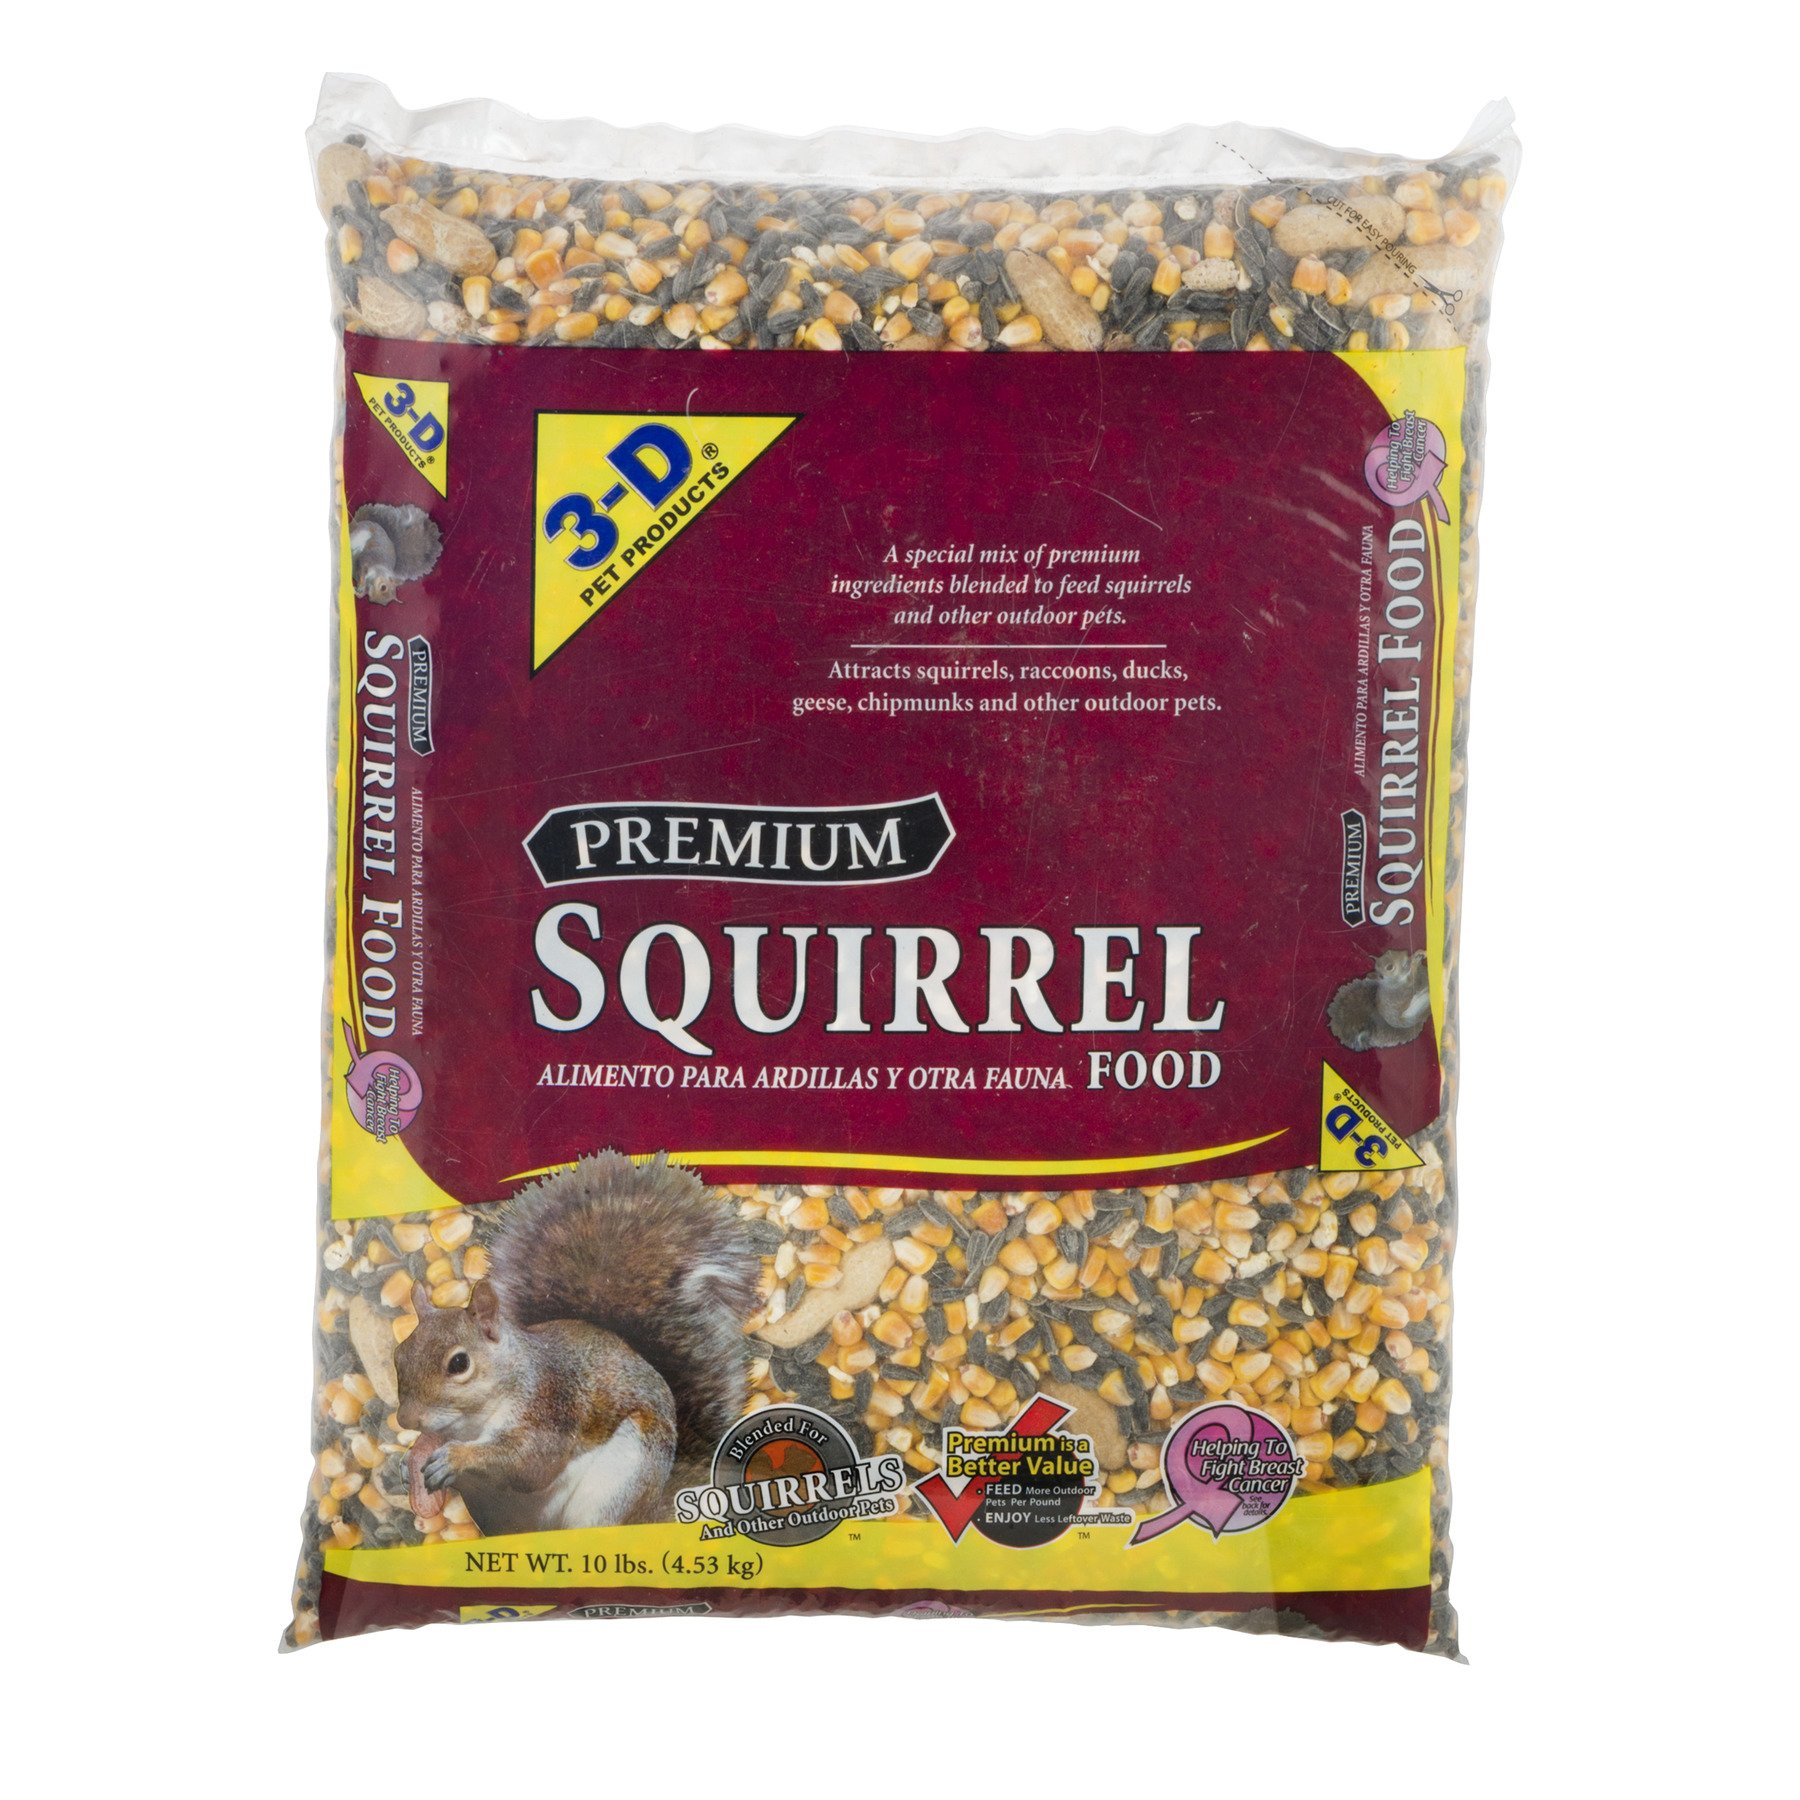 3-D Pet Products Premium Squirrel Food Dry Squirrel Food, 10 LB